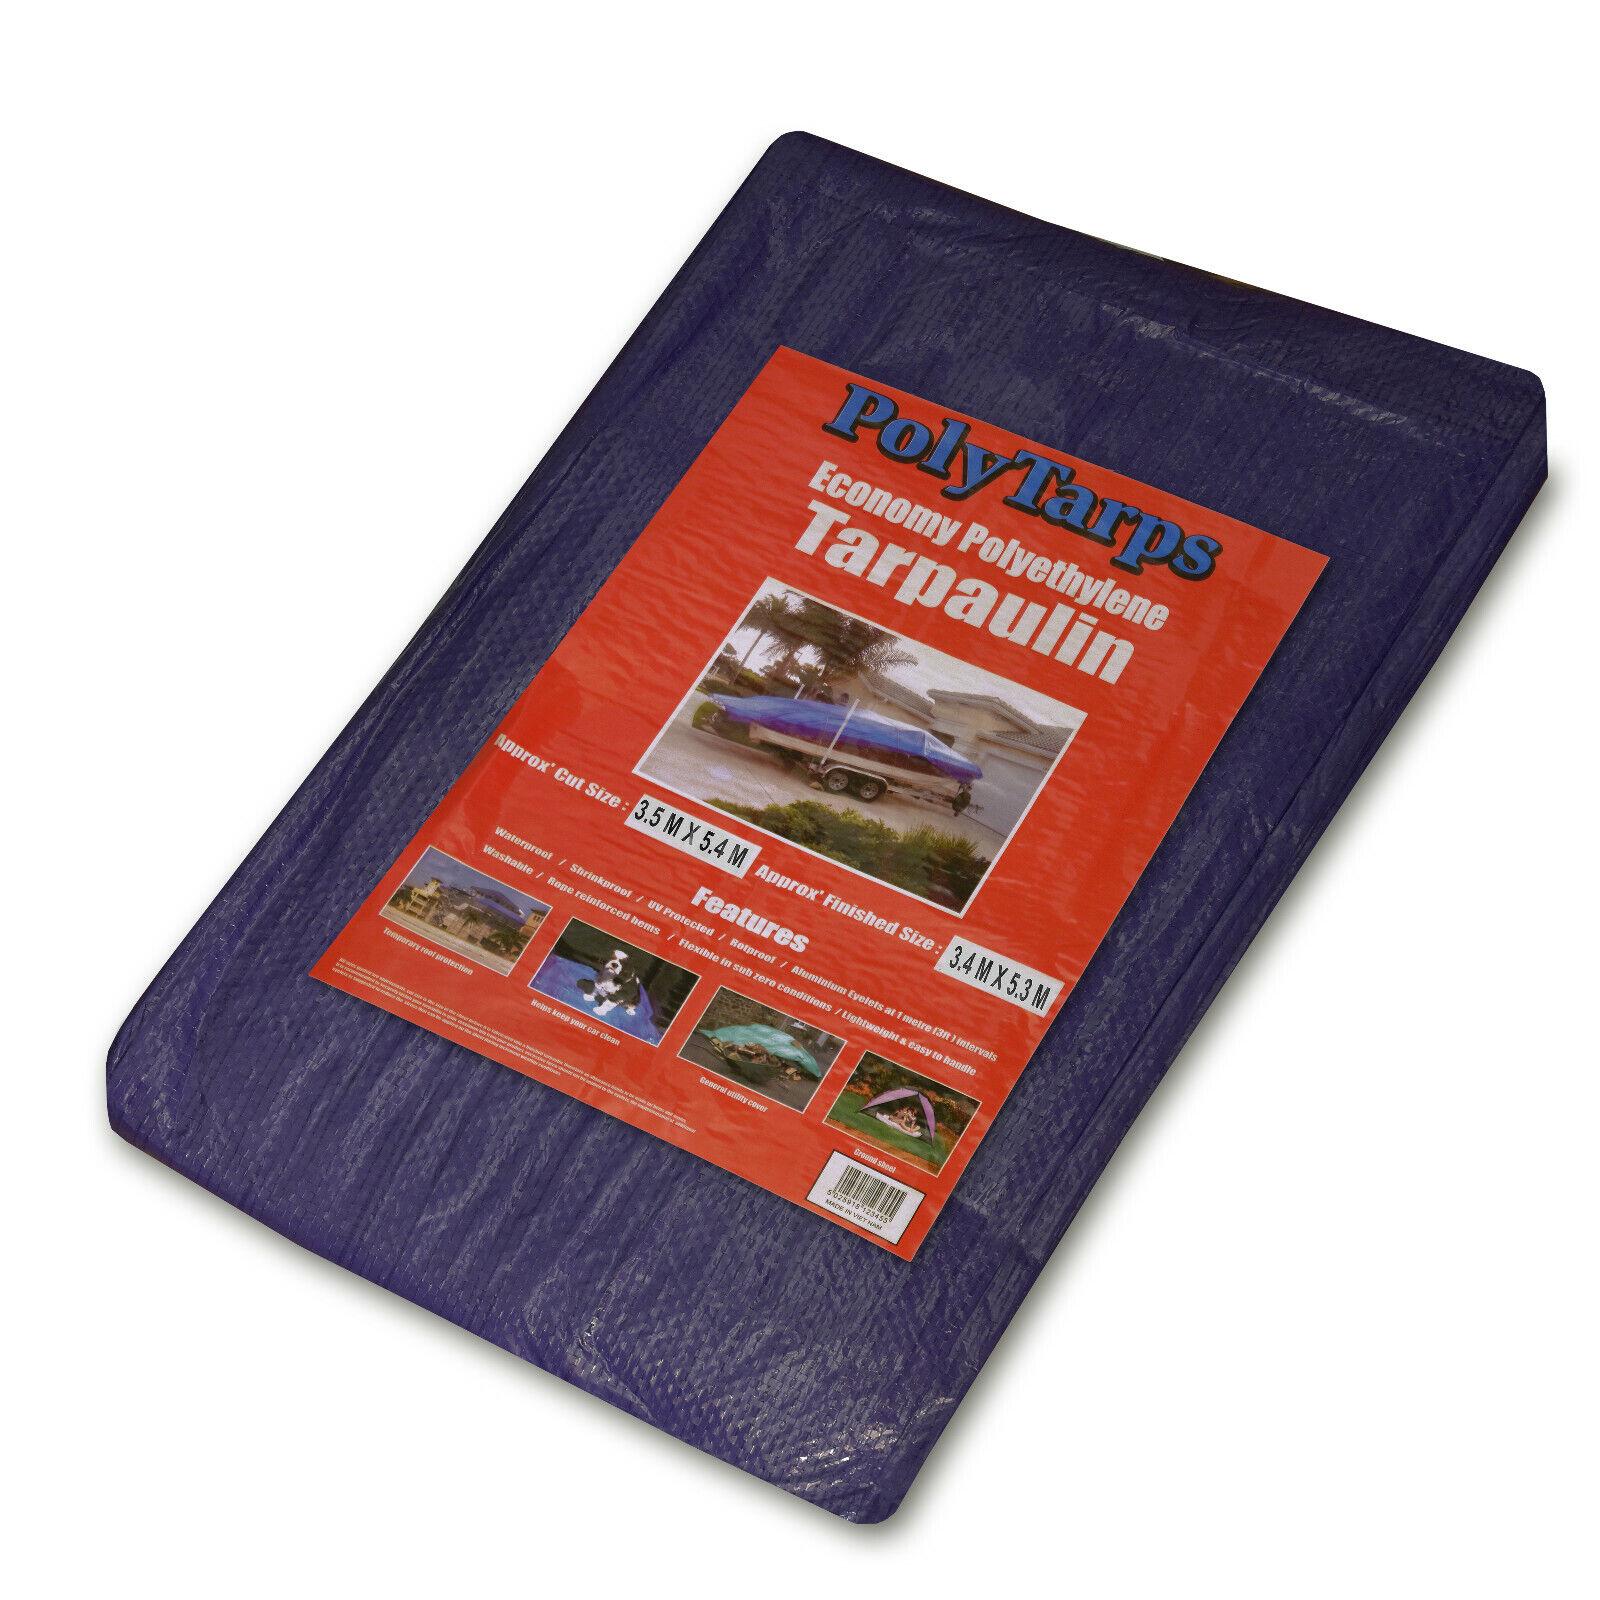 Waterproof Tarpaulin Ground Sheet Lightweight Camping Cover Tarp with Eyelets - 5